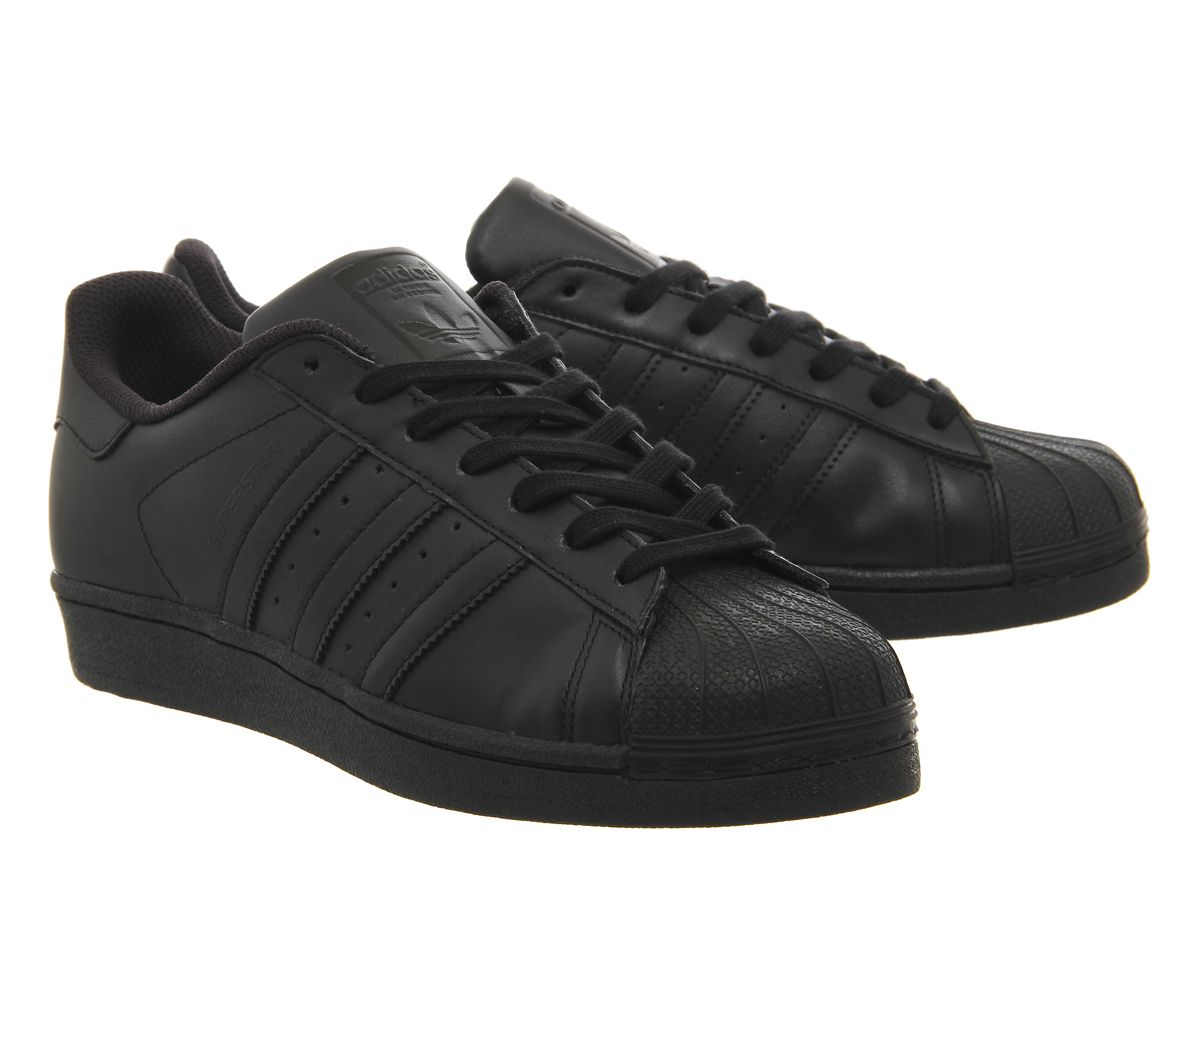 adidas superstar 1 white black foundation